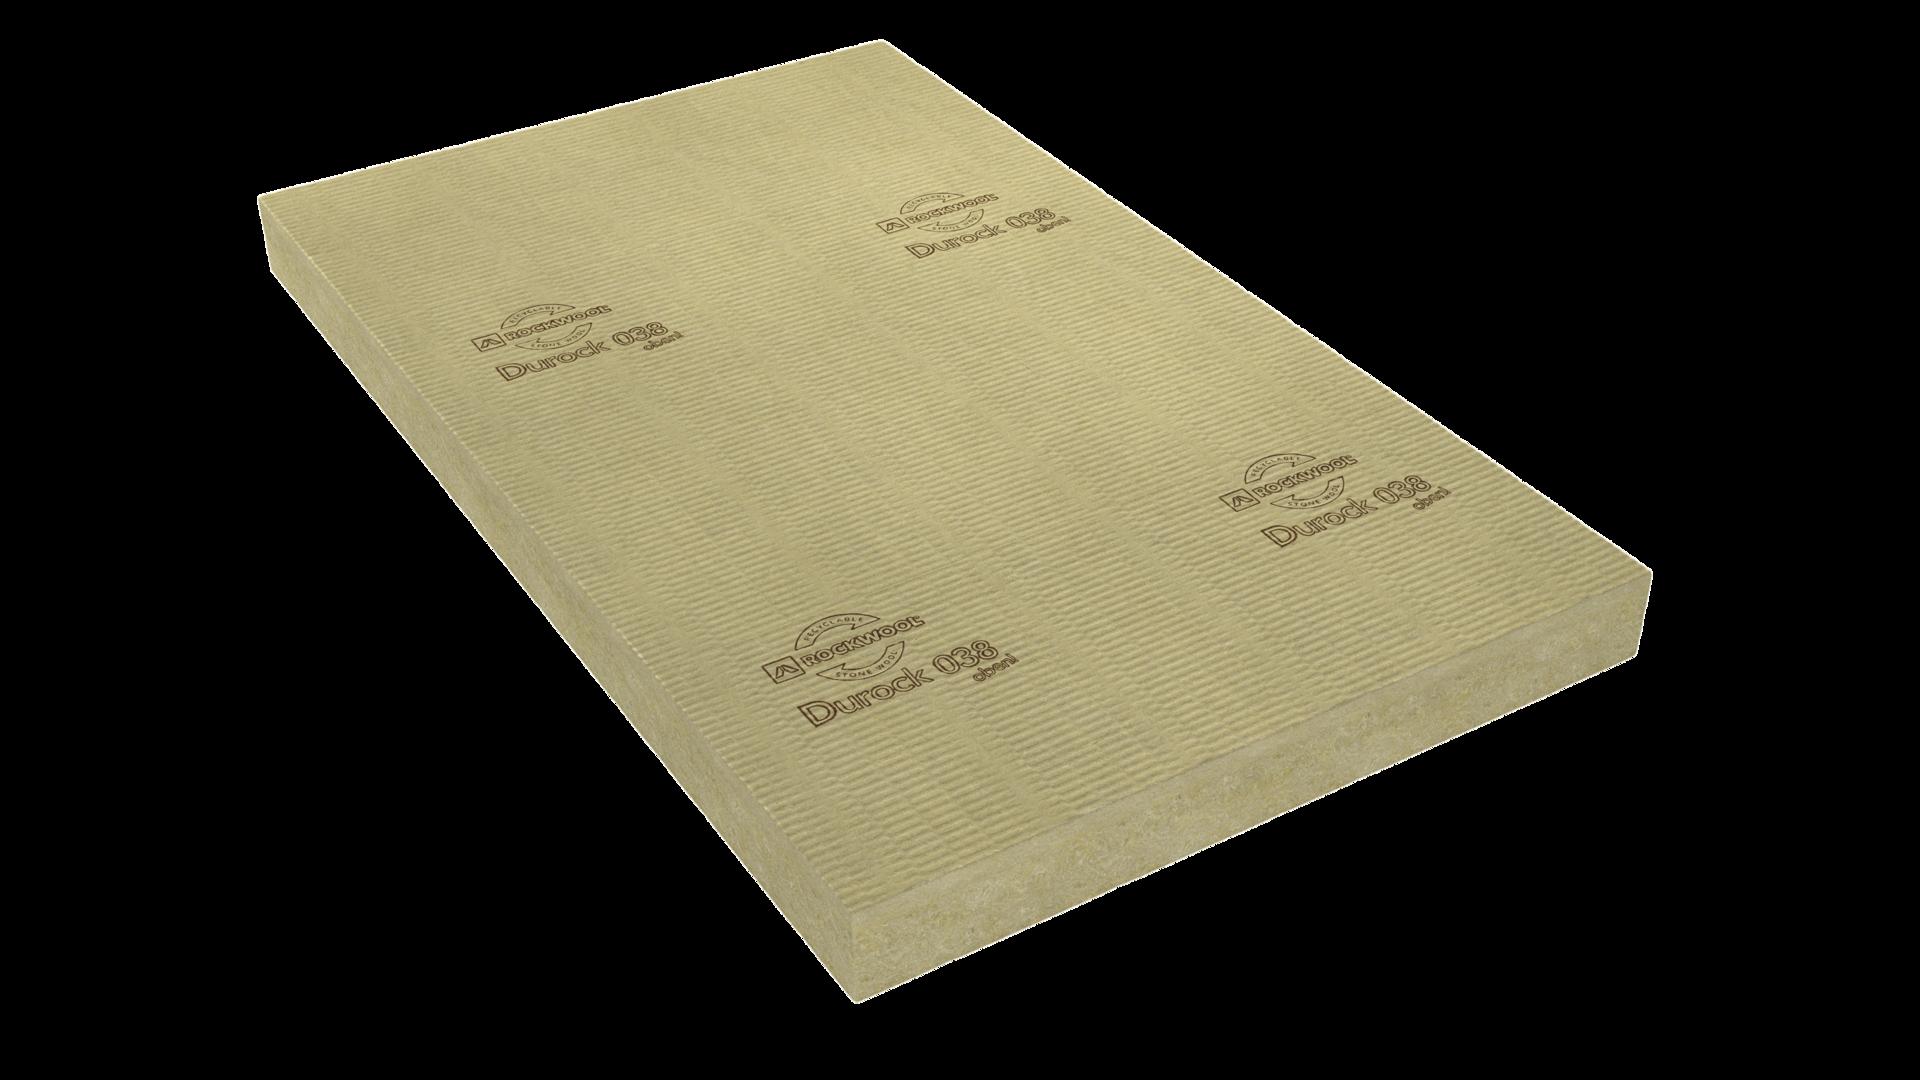 product, flatroof, flat roof, fri, durock 038, plate,  2000x1200 mm, germany, PIM, flachdach